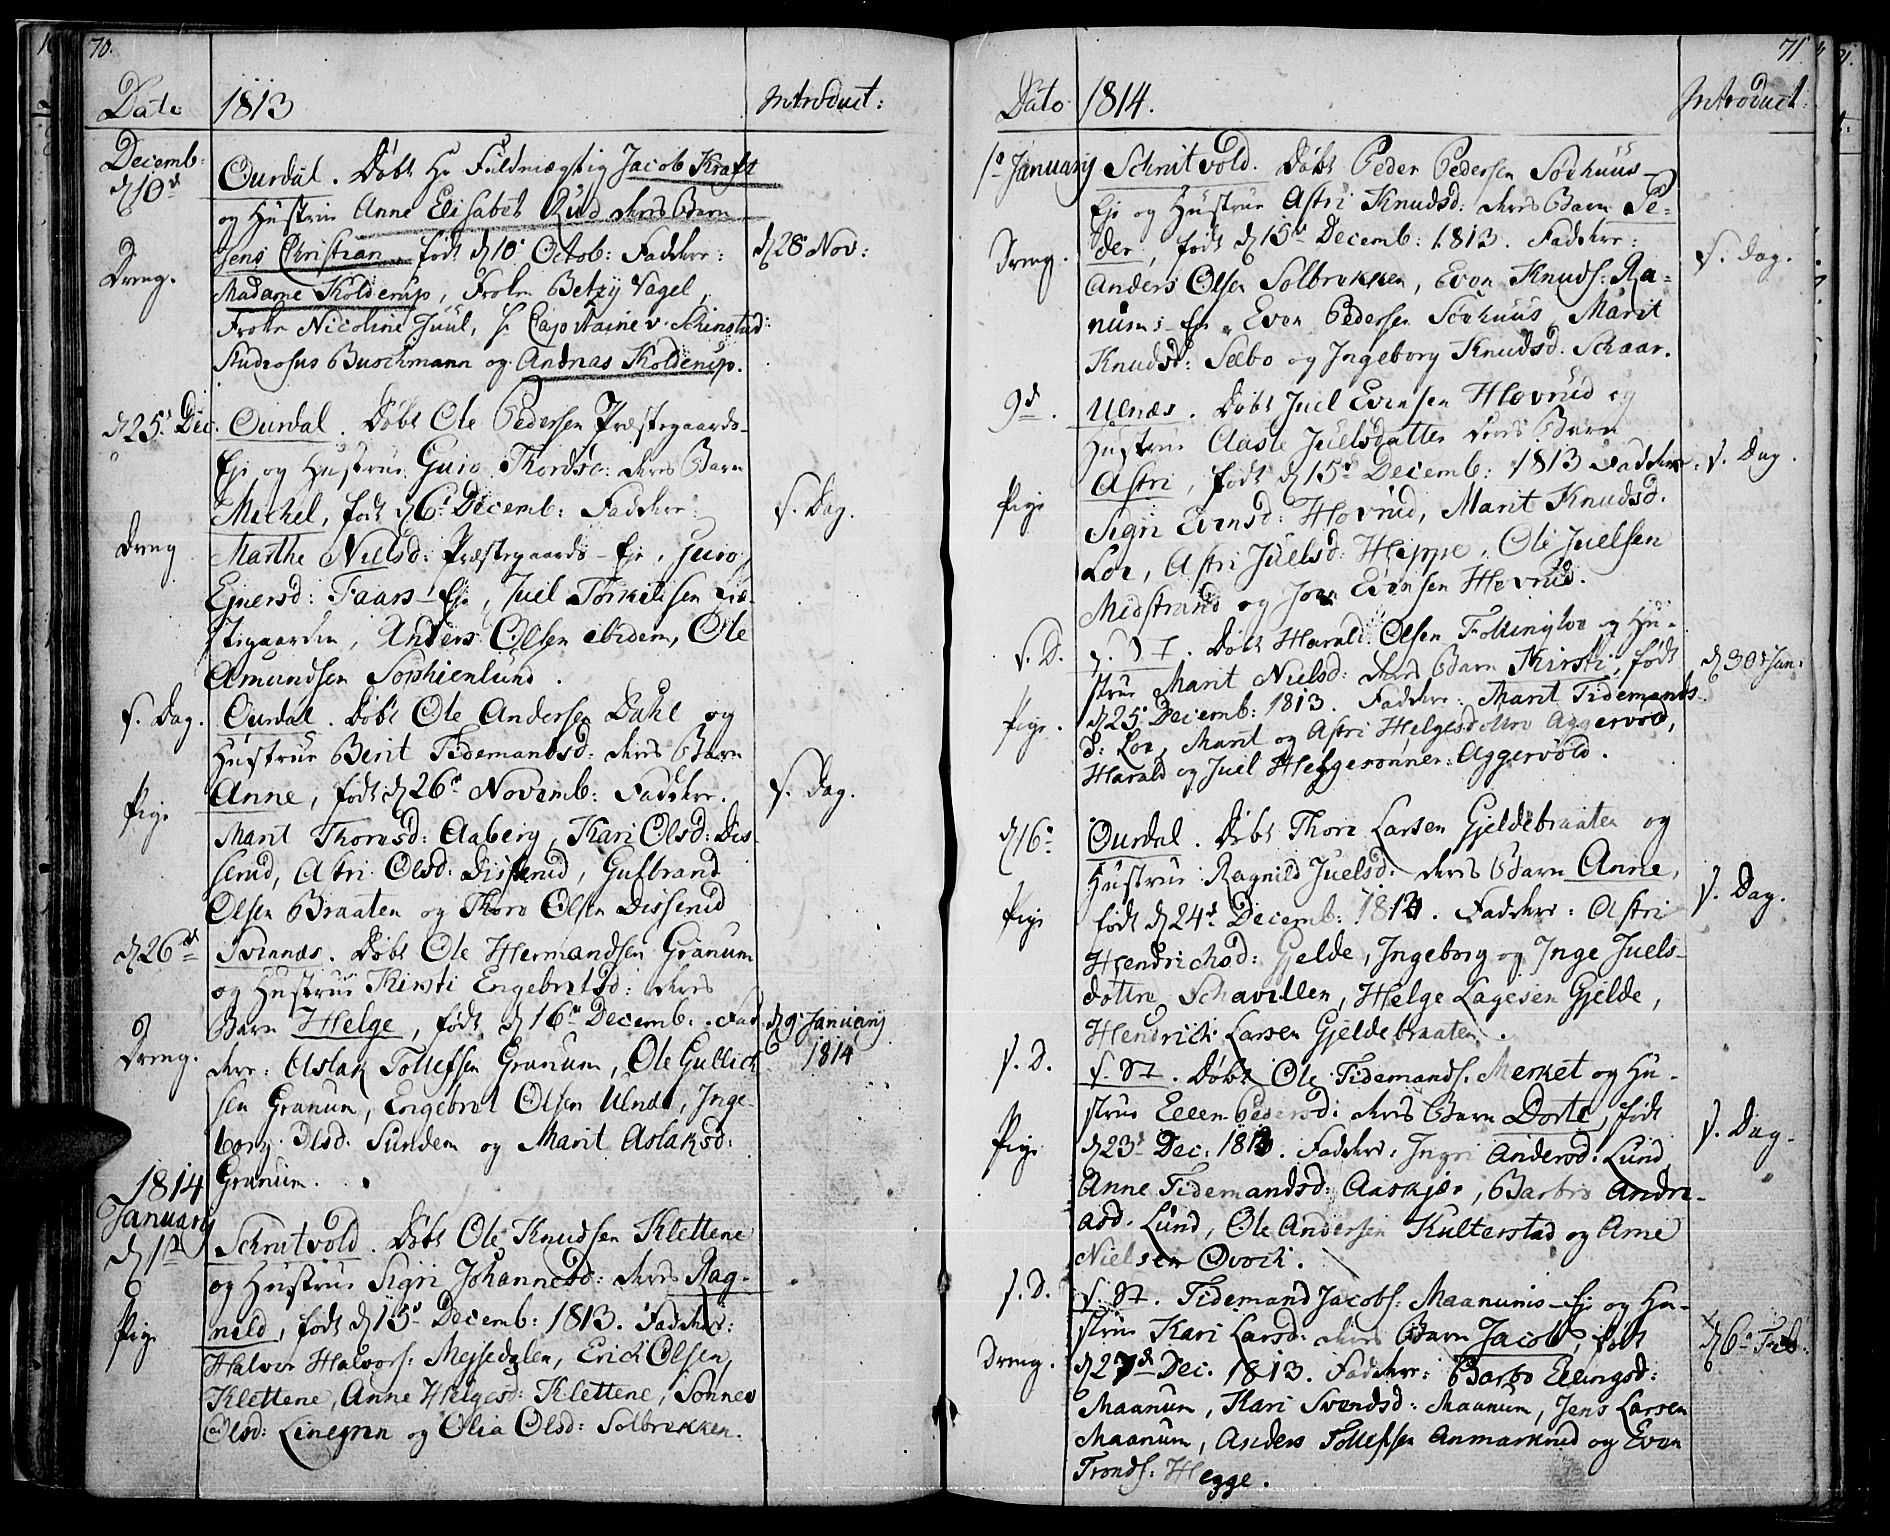 SAH, Nord-Aurdal prestekontor, Ministerialbok nr. 1, 1808-1815, s. 70-71